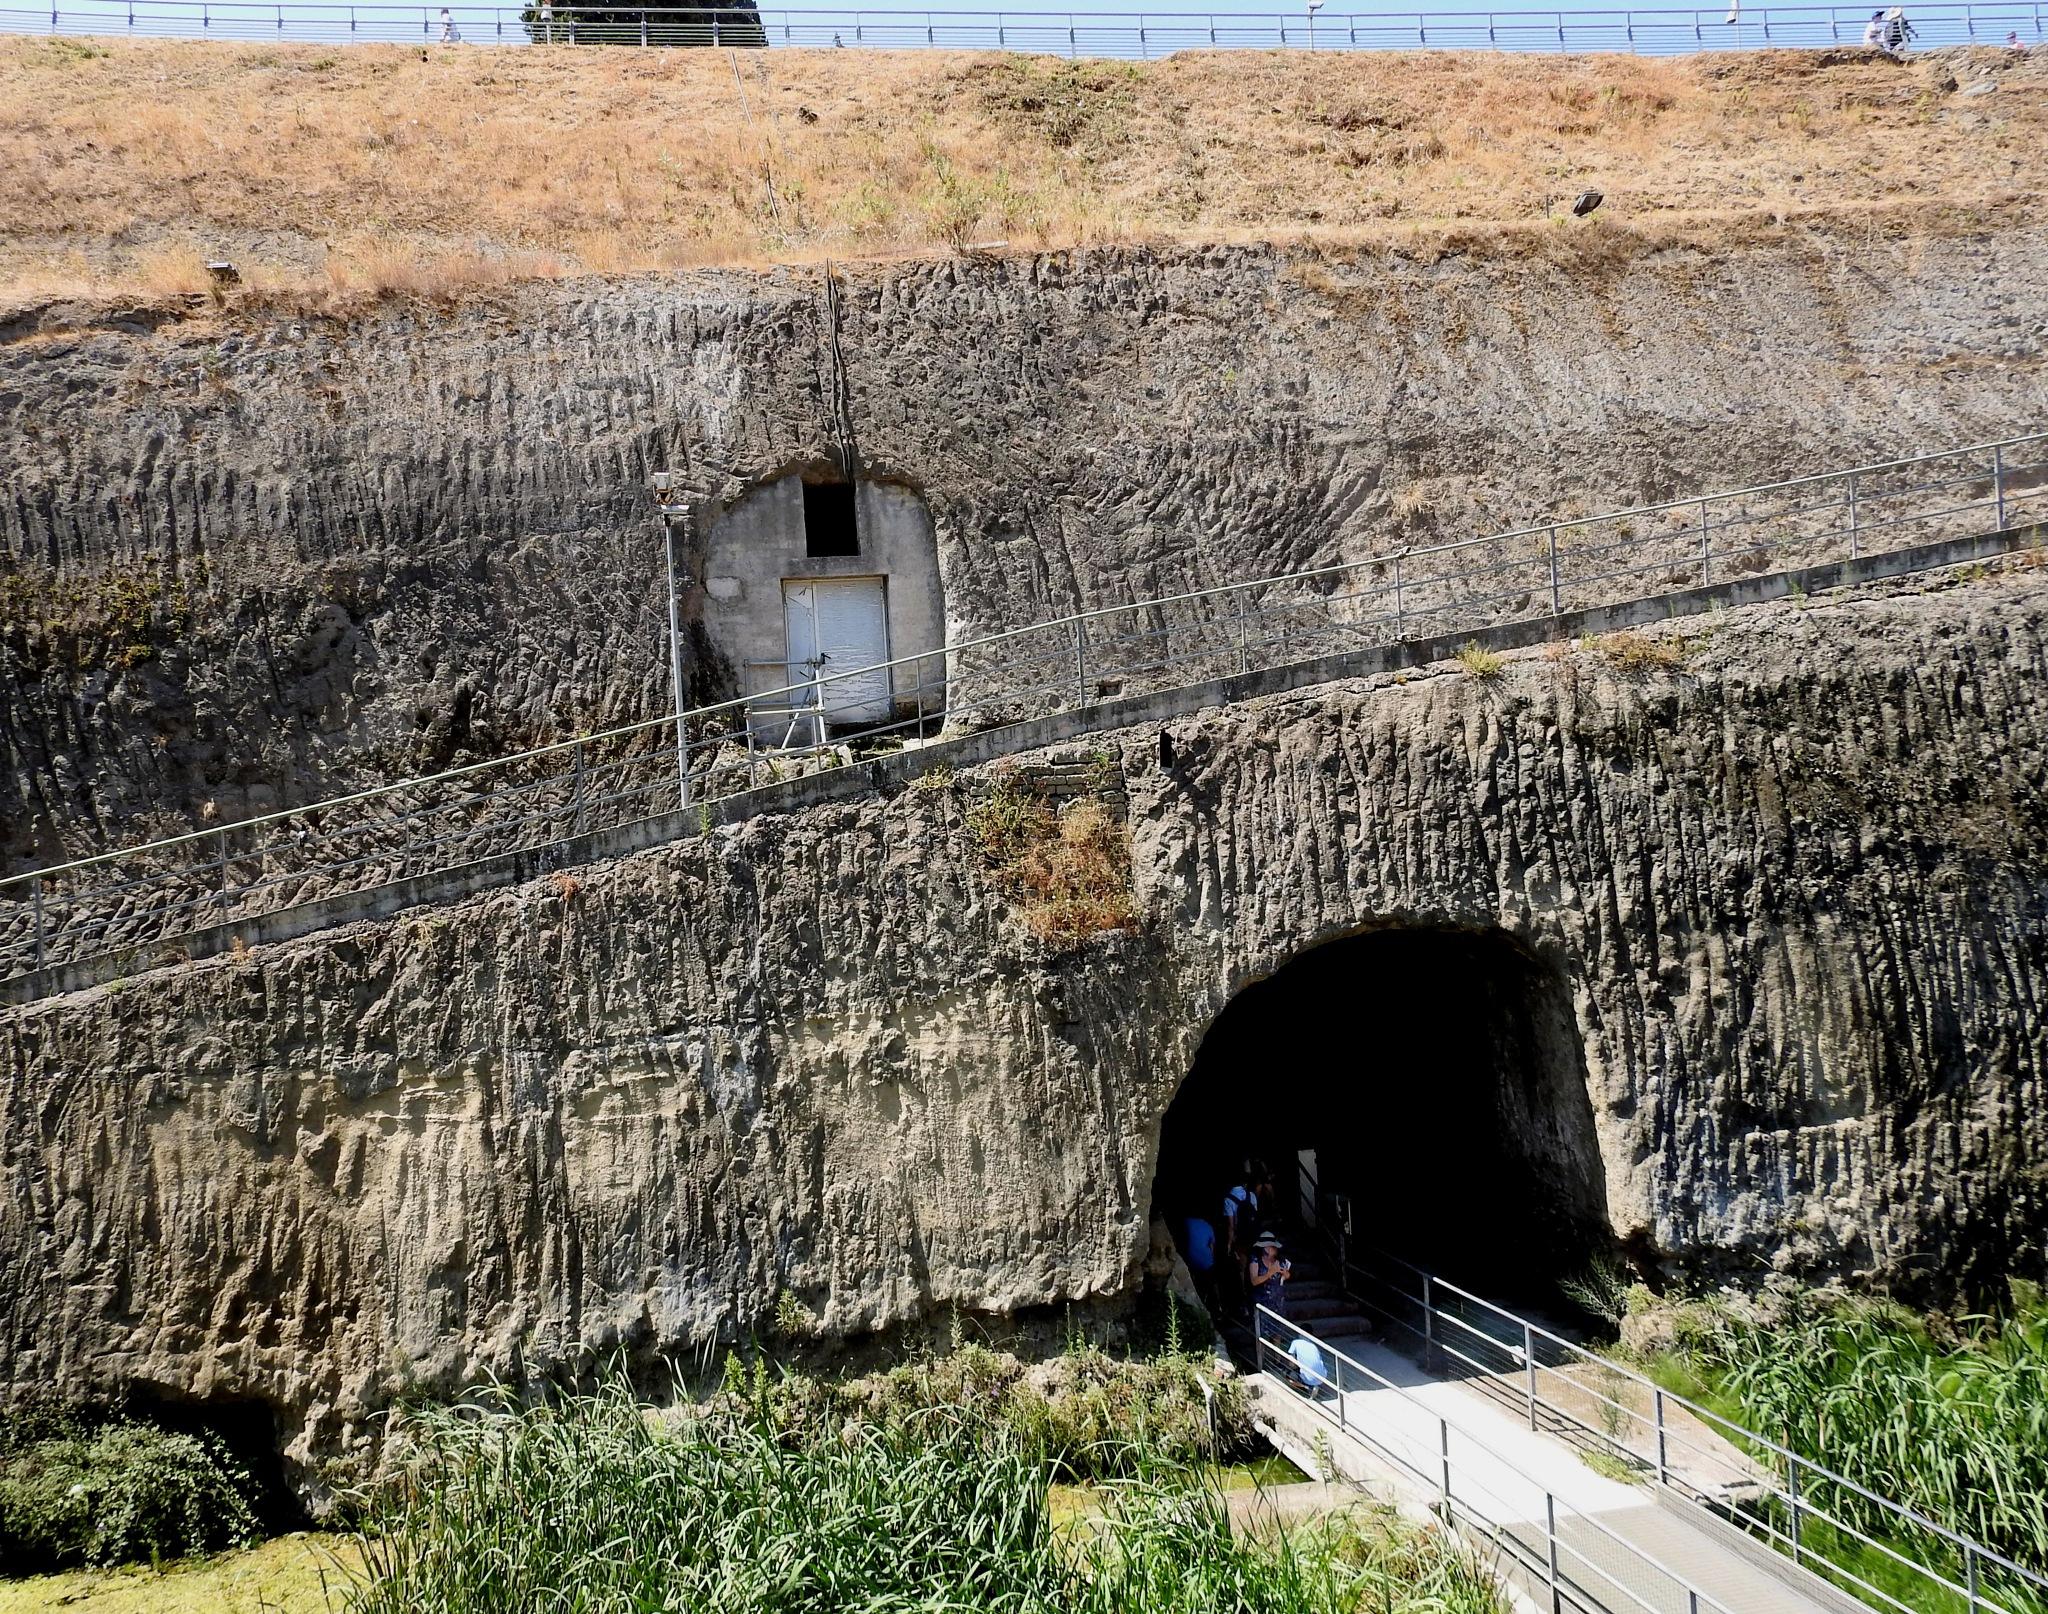 Hercolaneum Ercolano [Naples] - The Lava And Mud Wall - 2 by Arnaldo De Lisio